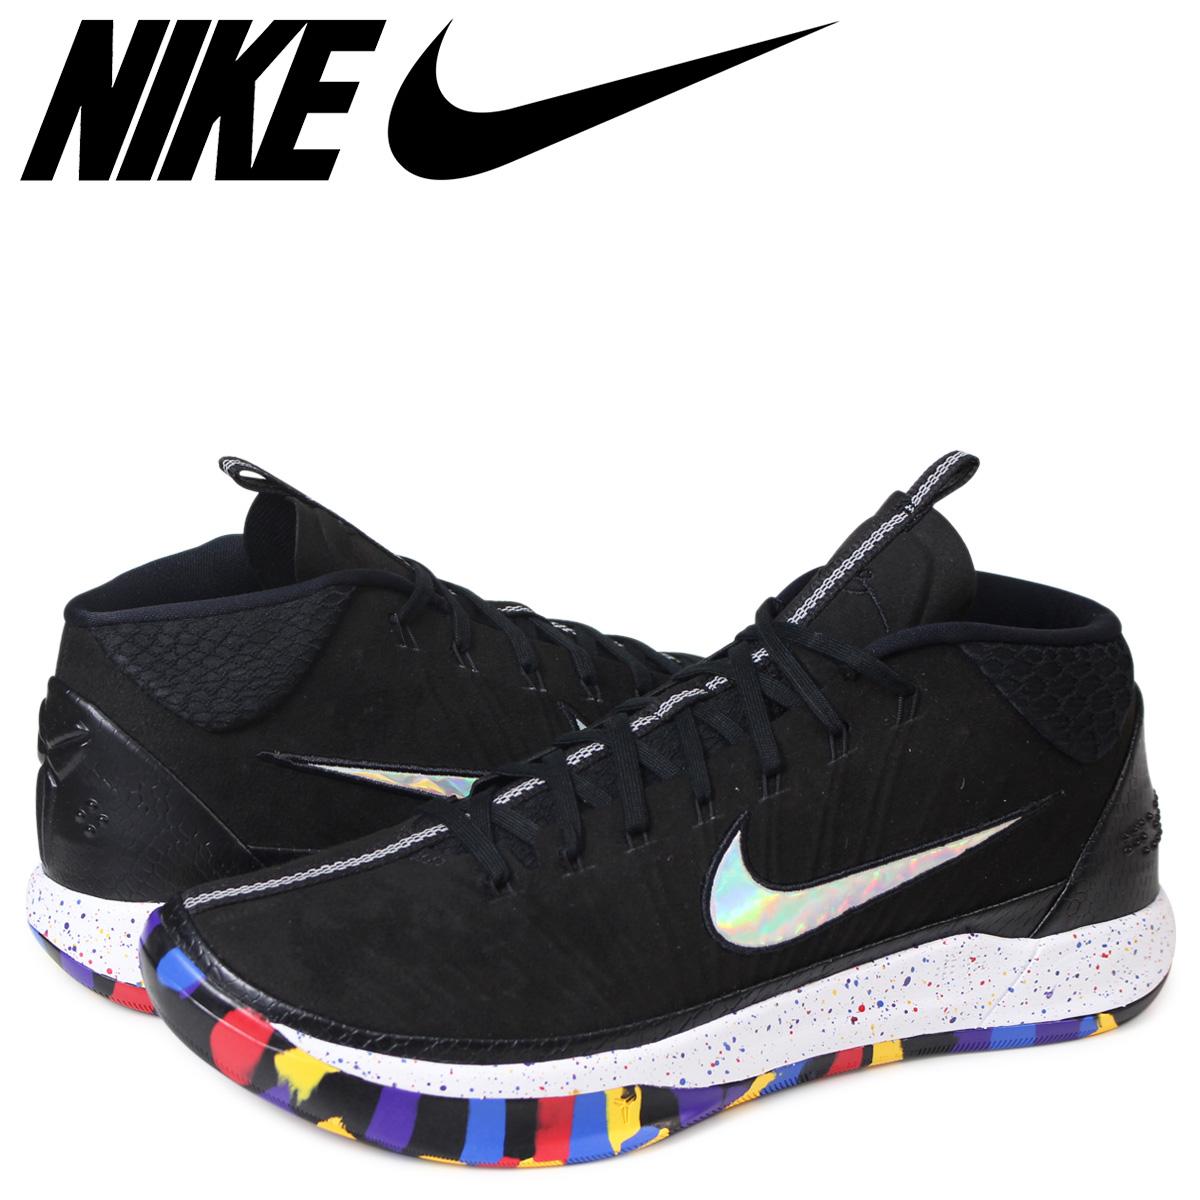 1785517ab90 ... promo code nike kobe ad mm ep nike corby sneakers men aj6922 001 black  7e683 528a5 ...